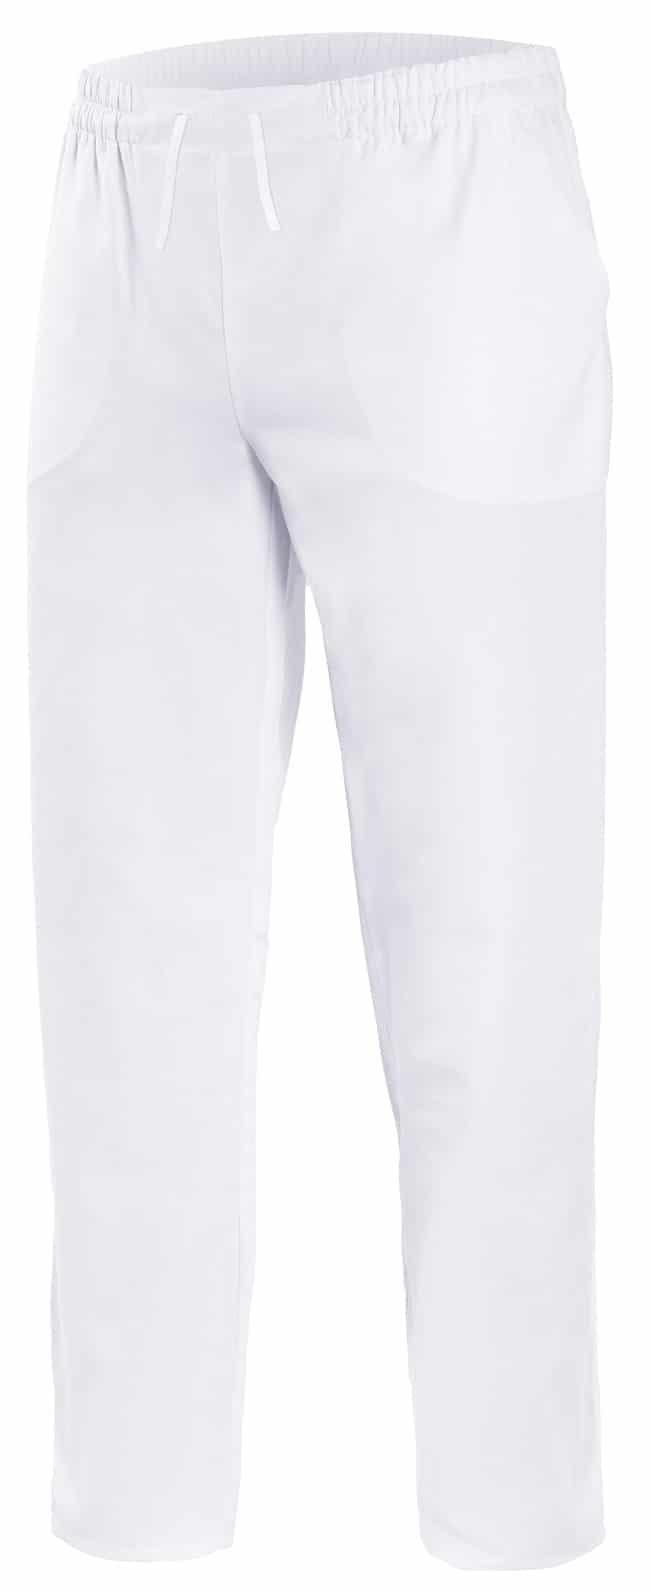 Velilla 533001 PantalÓn Pijama Con Cintas Blanco